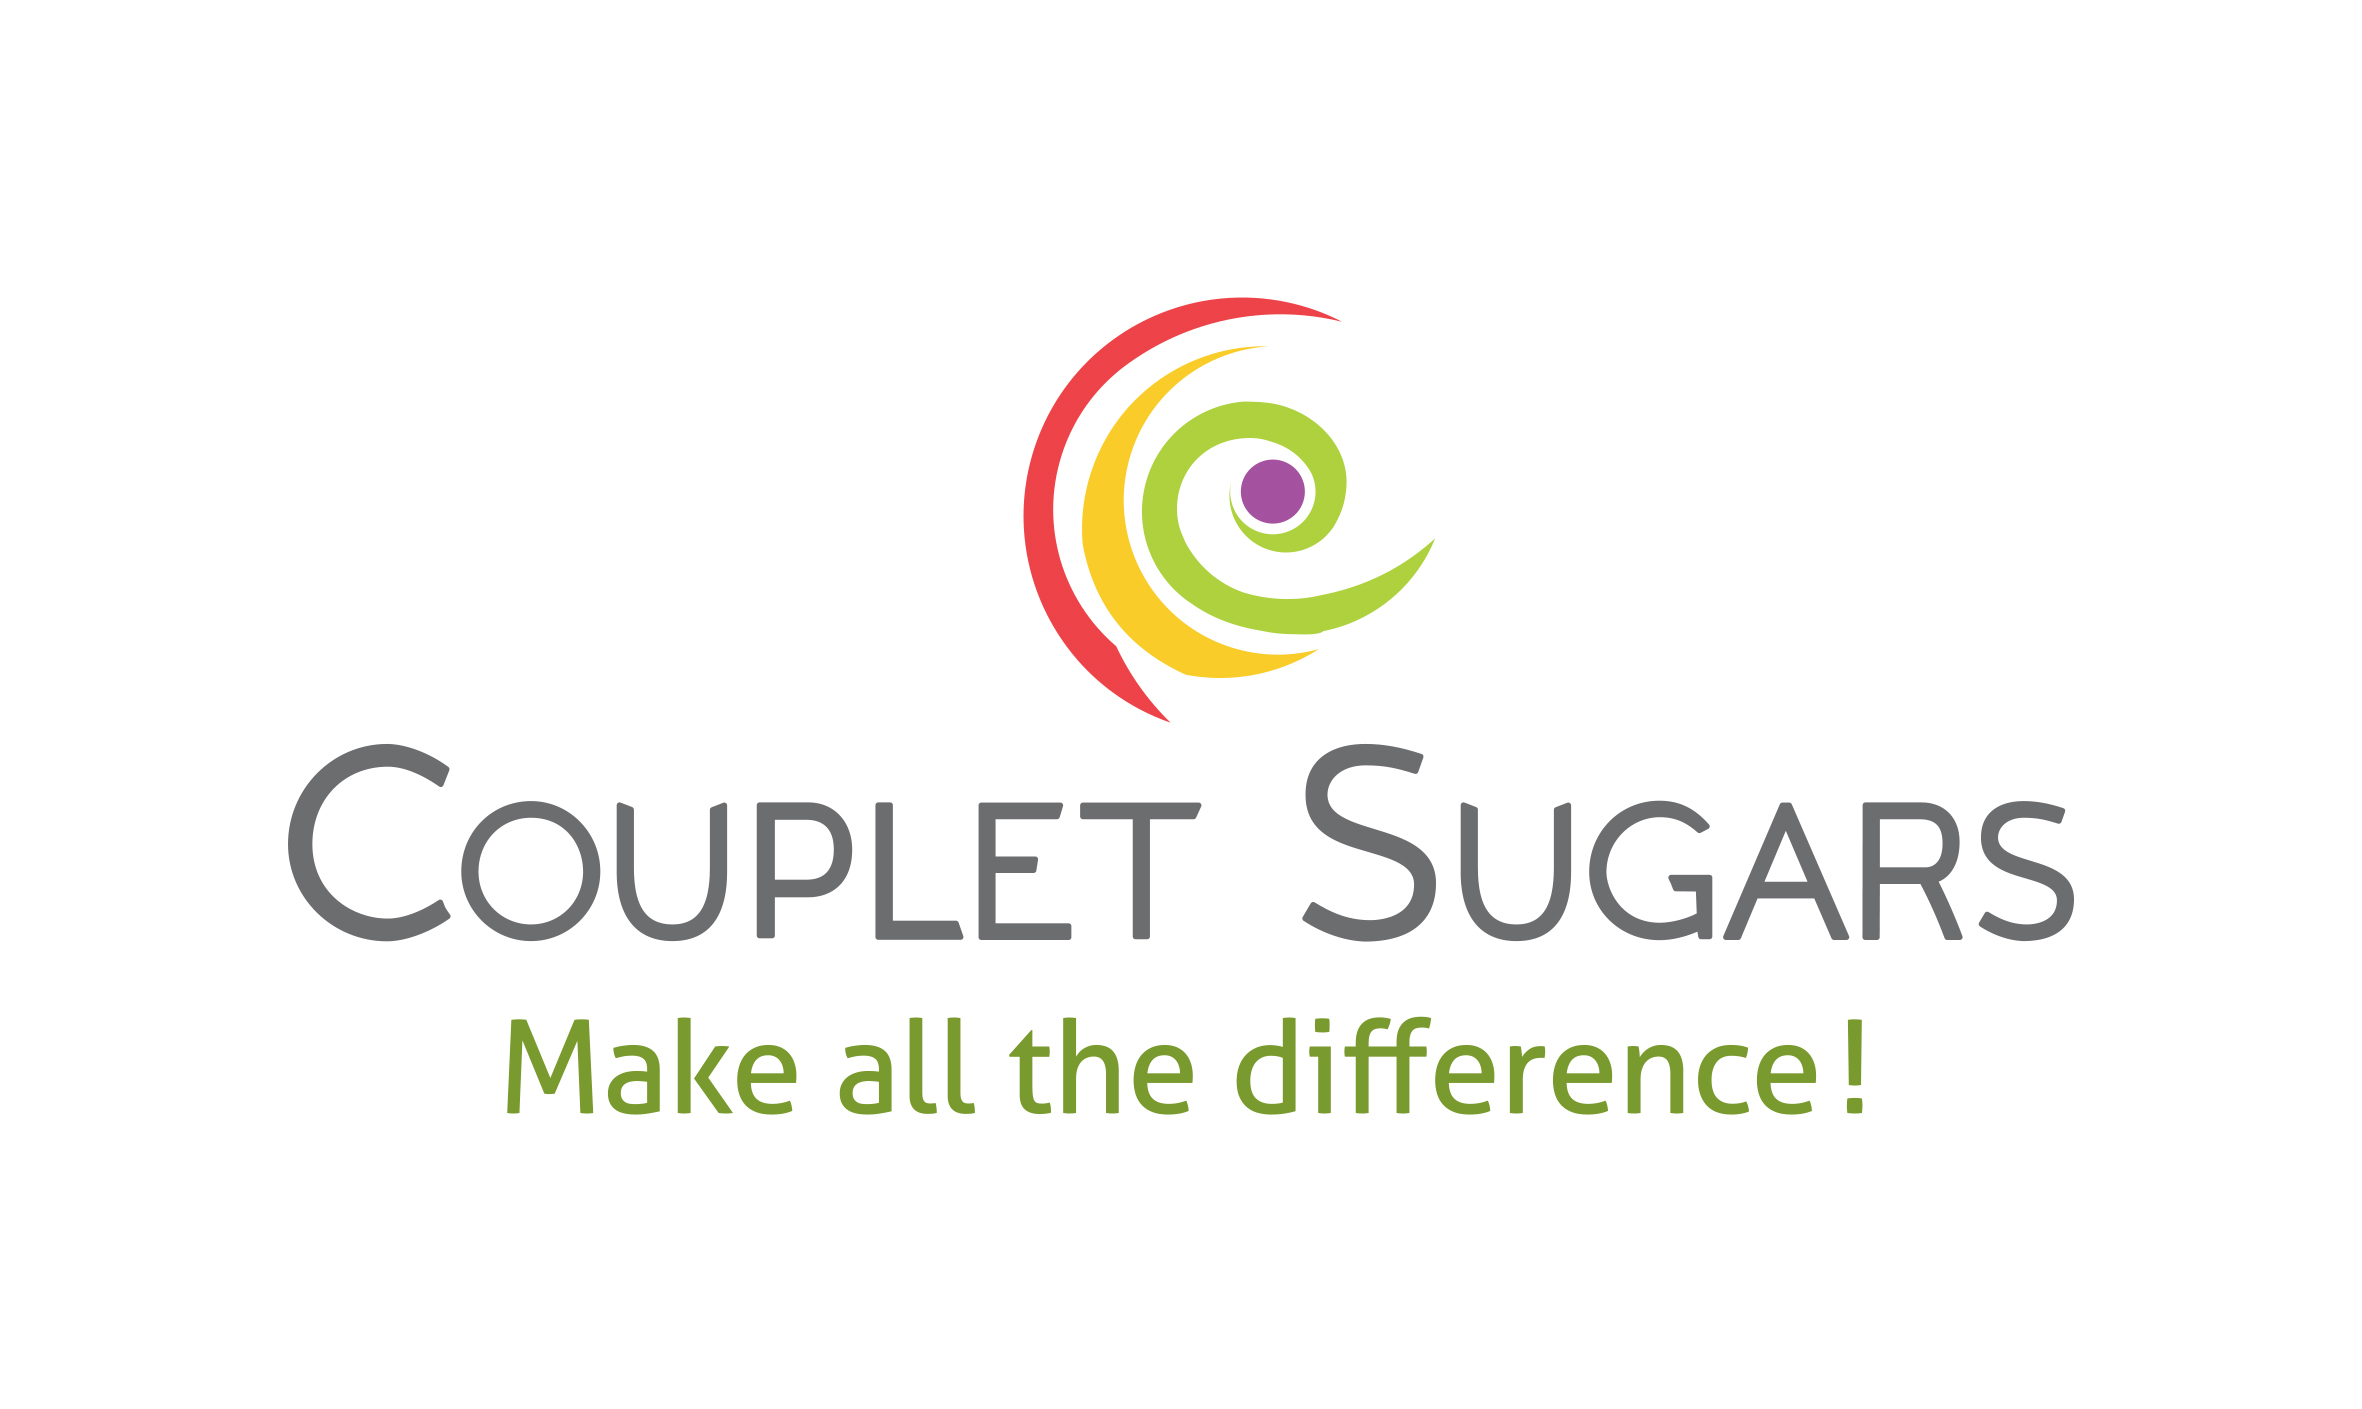 Logo https://www.food-dynamics.nl/wp-content/uploads/2020/05/Food-Dynamics-referentie-logo-Couplet-Sugars-15.jpg